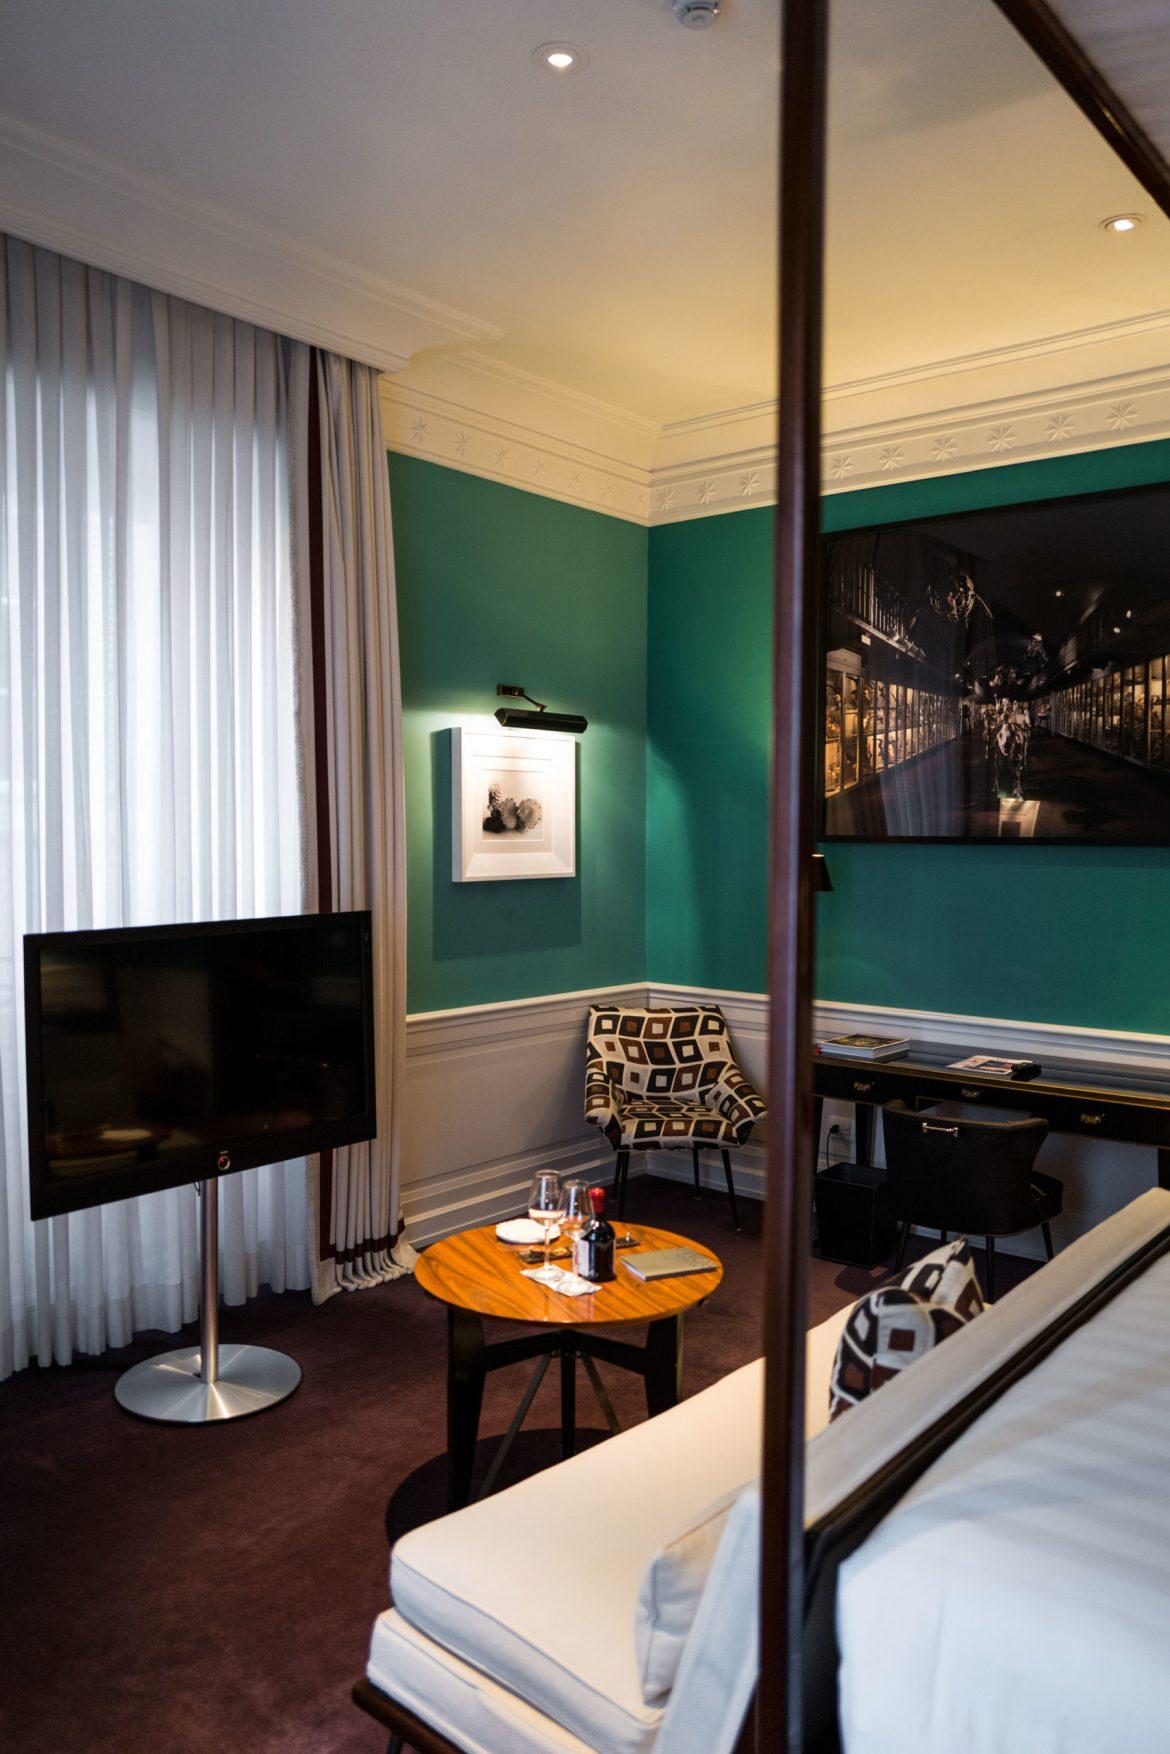 JK Place Roma hotel in Rome, The Taste Edit #hotel #rome #travel #decor #italy